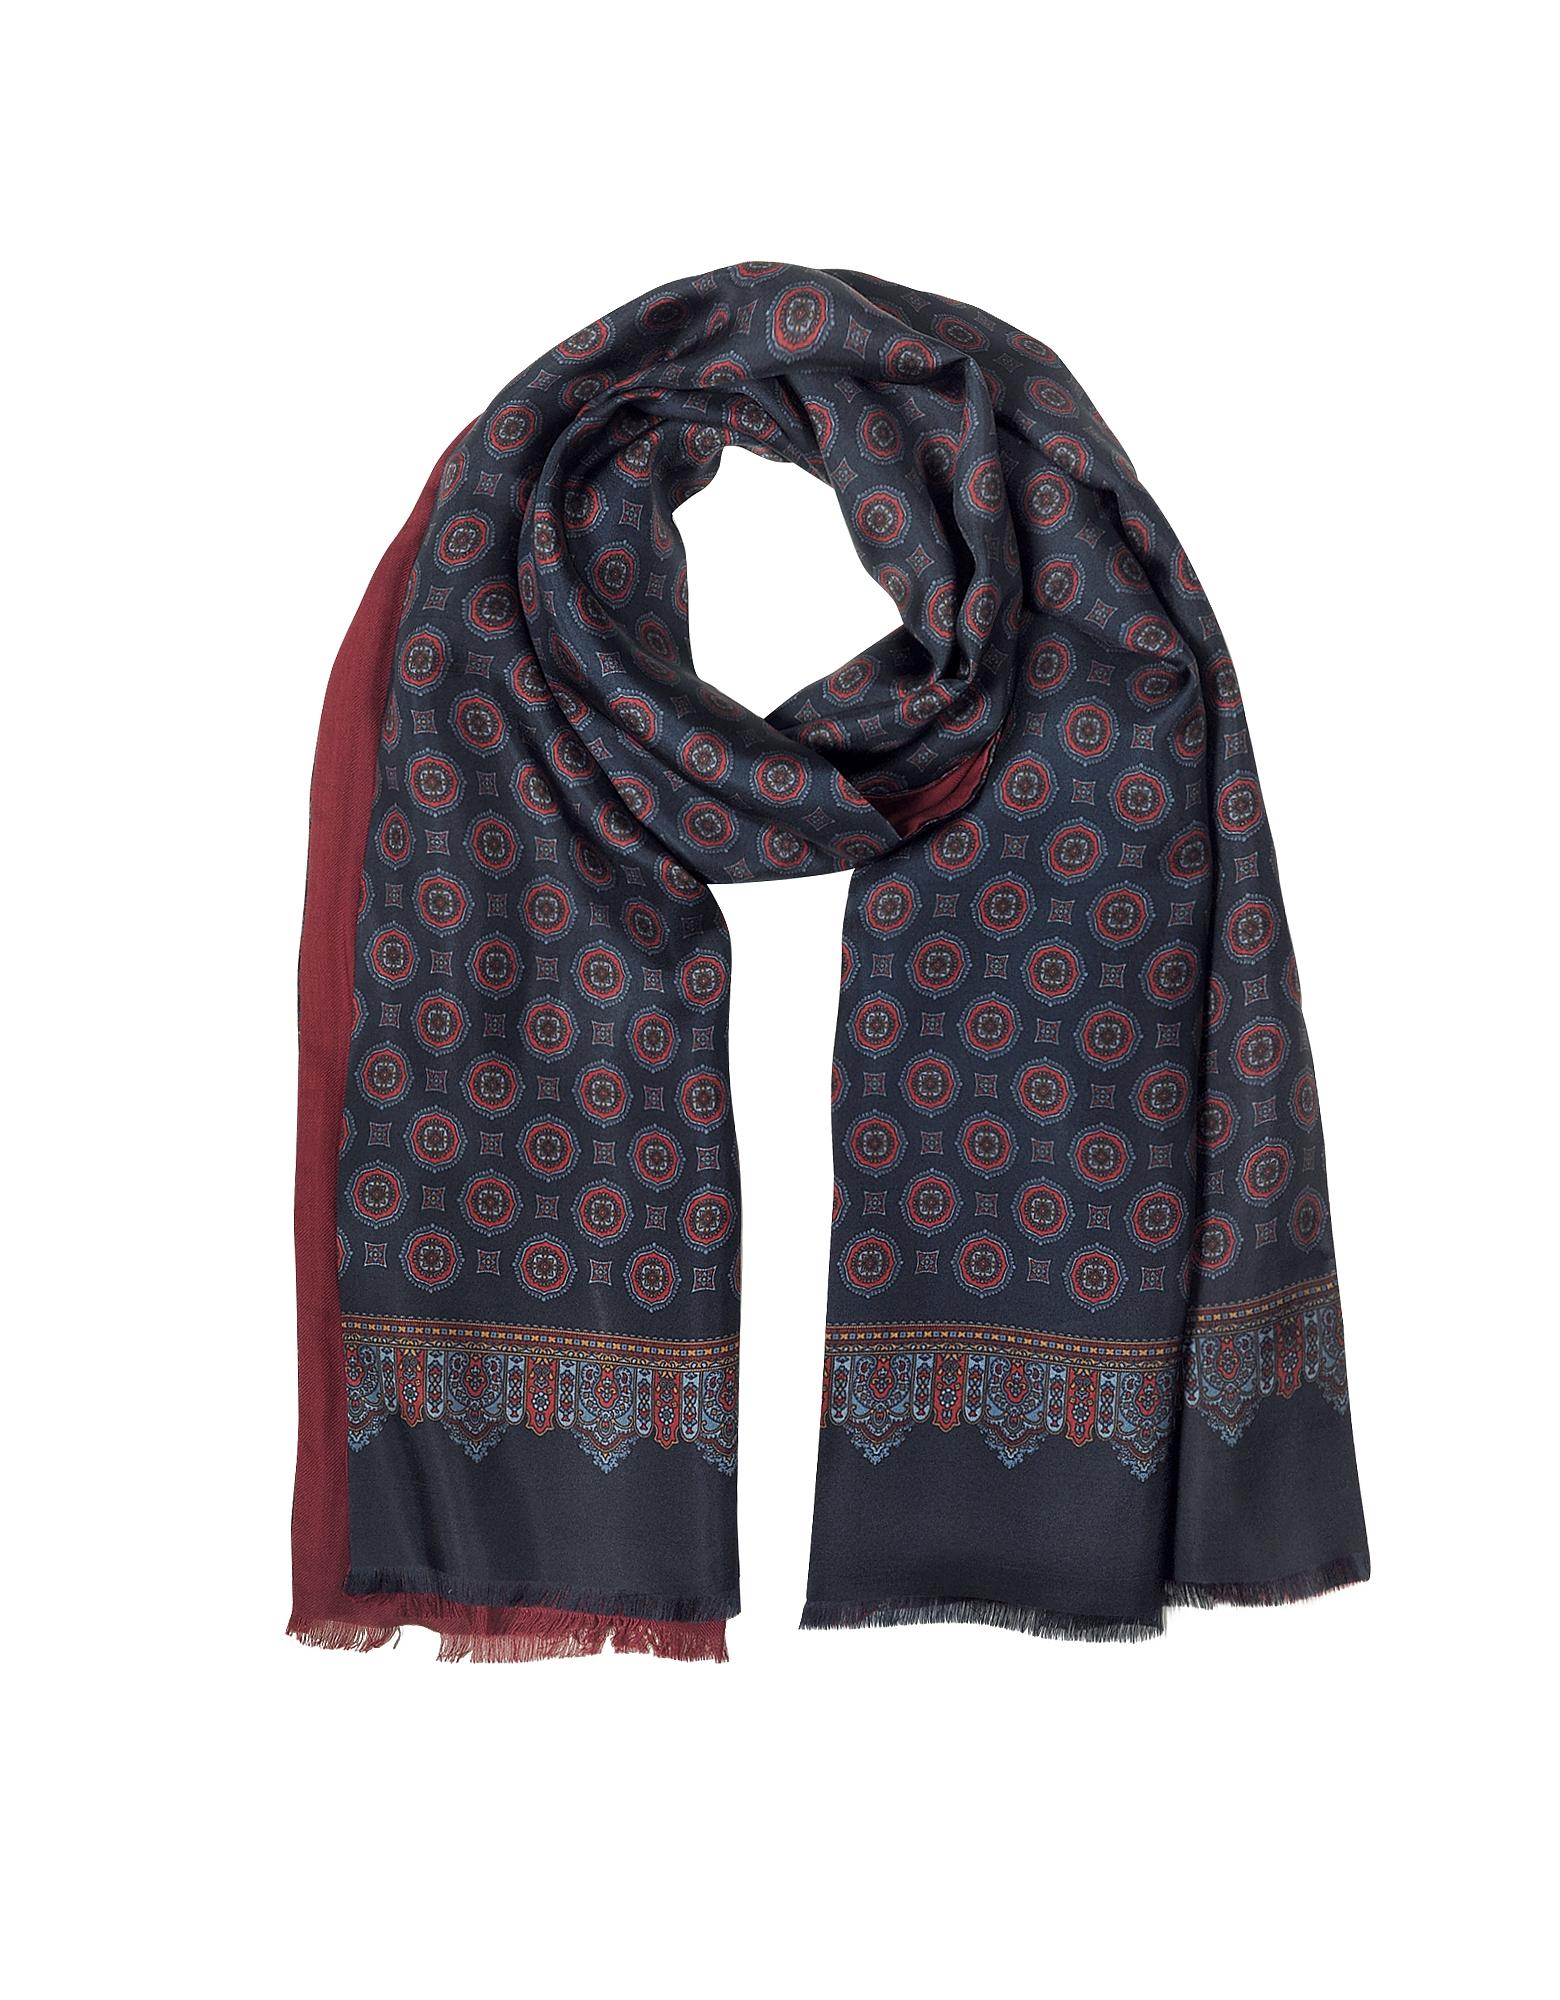 Blue & Burgundy Modal & Silk Ornamental Print Men's Fringed Scarf